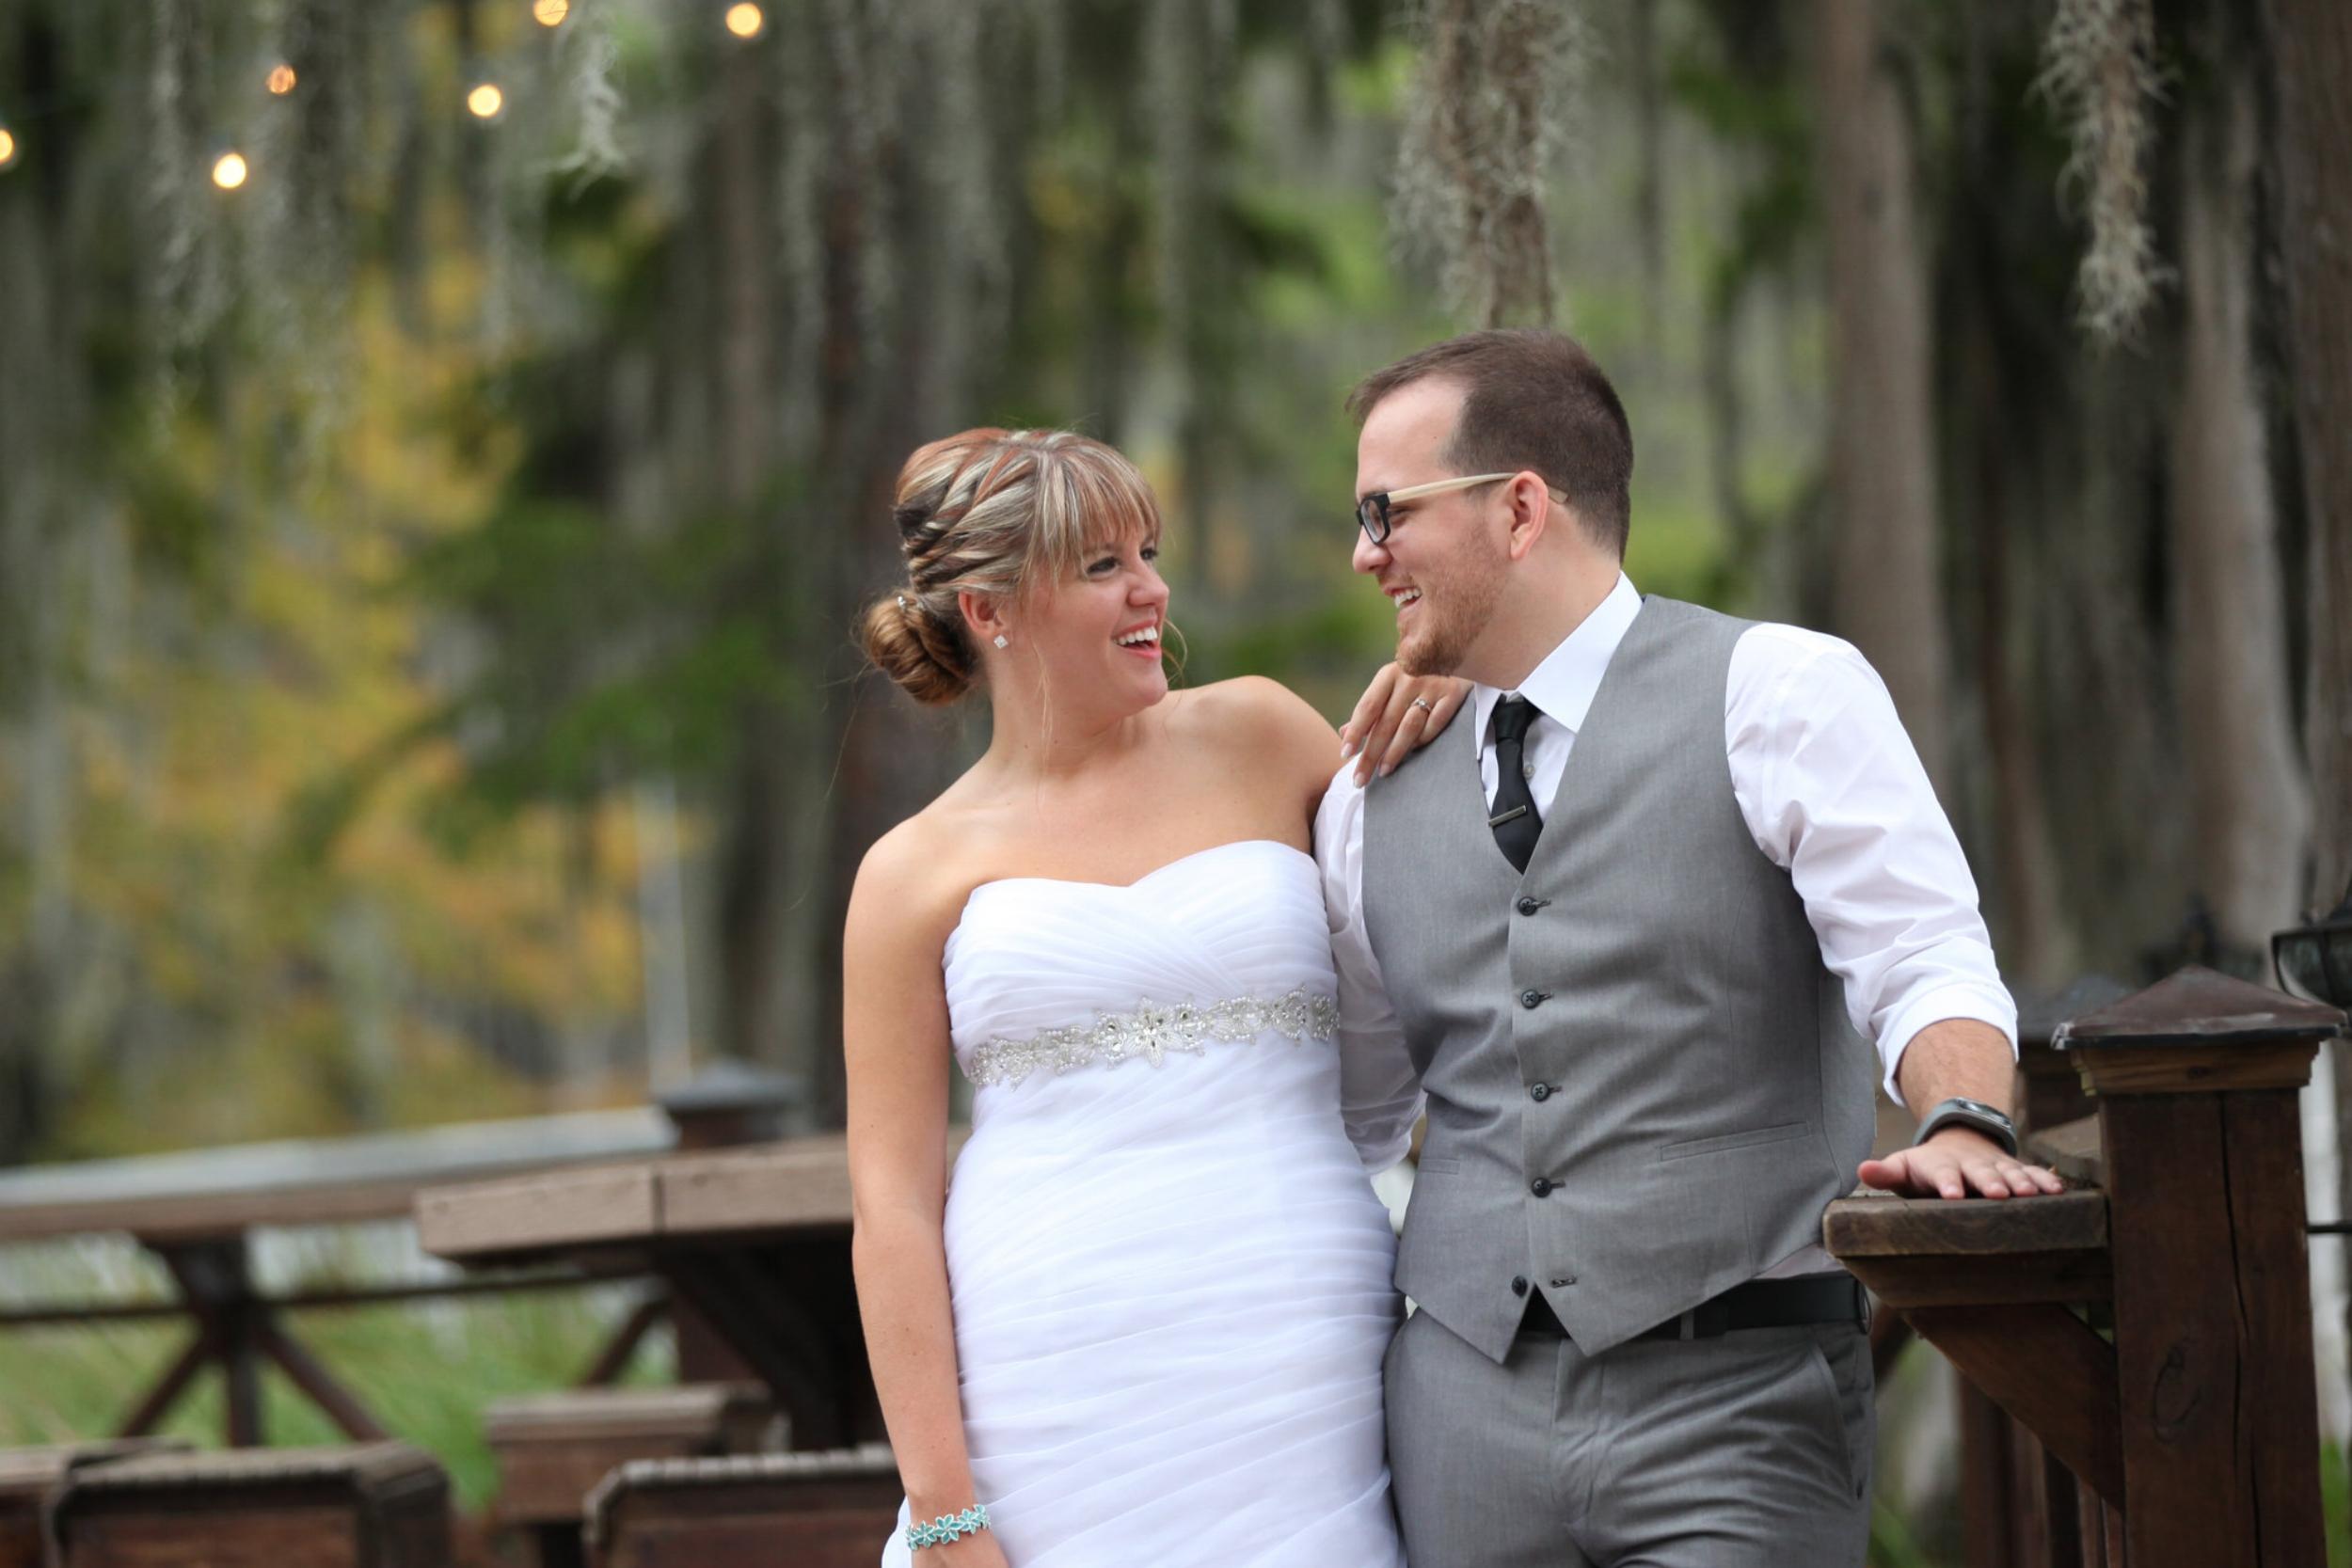 candid wedding photography.jpg